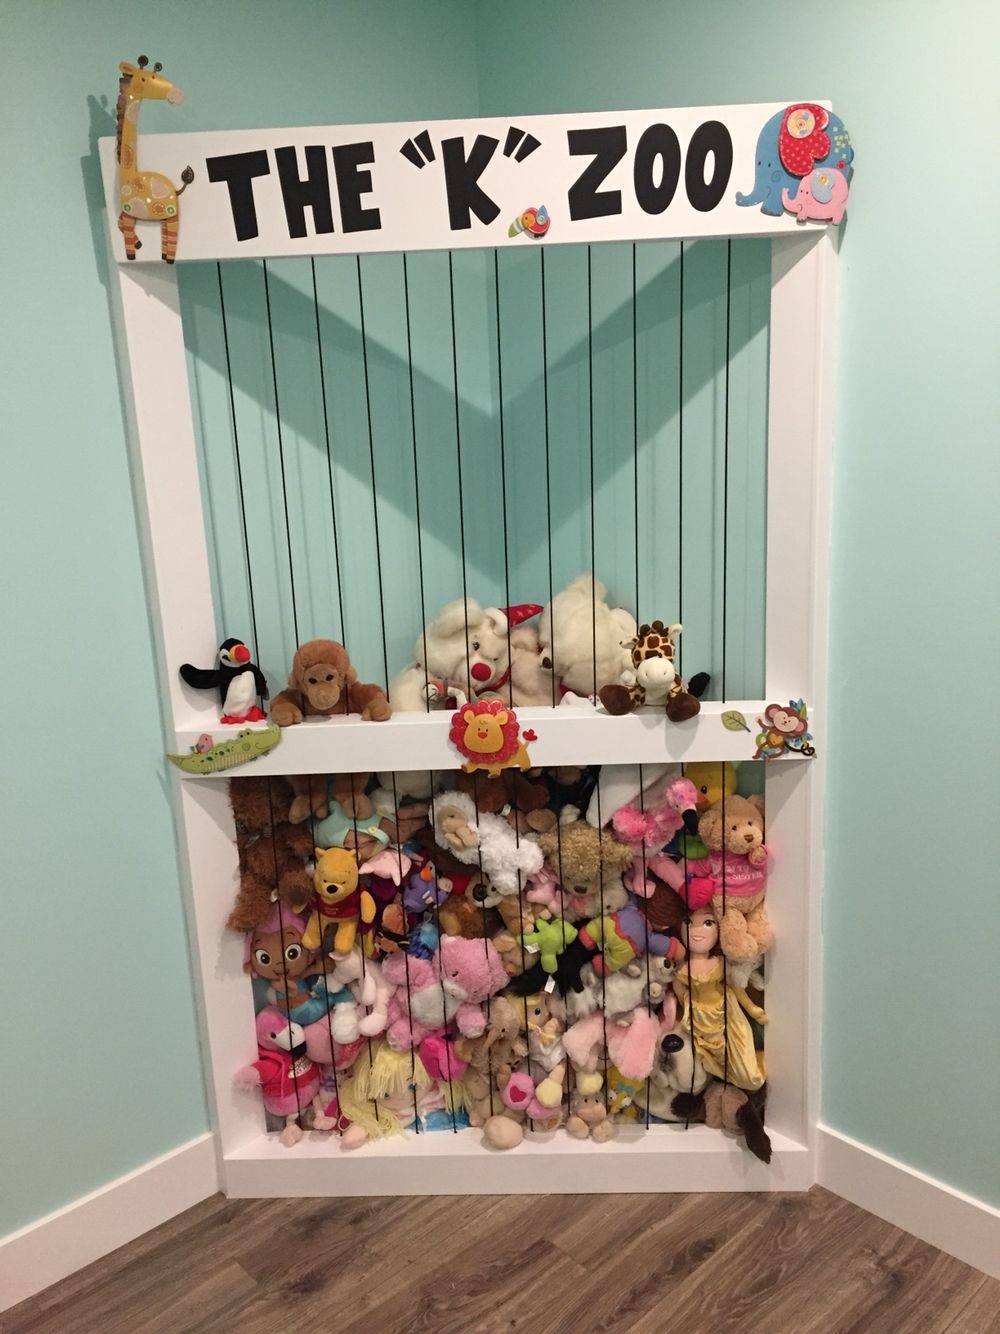 Stuffy Zoo Play Room Bungee Cord Cricut Vinyl Toy Room Toy Room Organization Kids Room Organization Bookshelves Kids